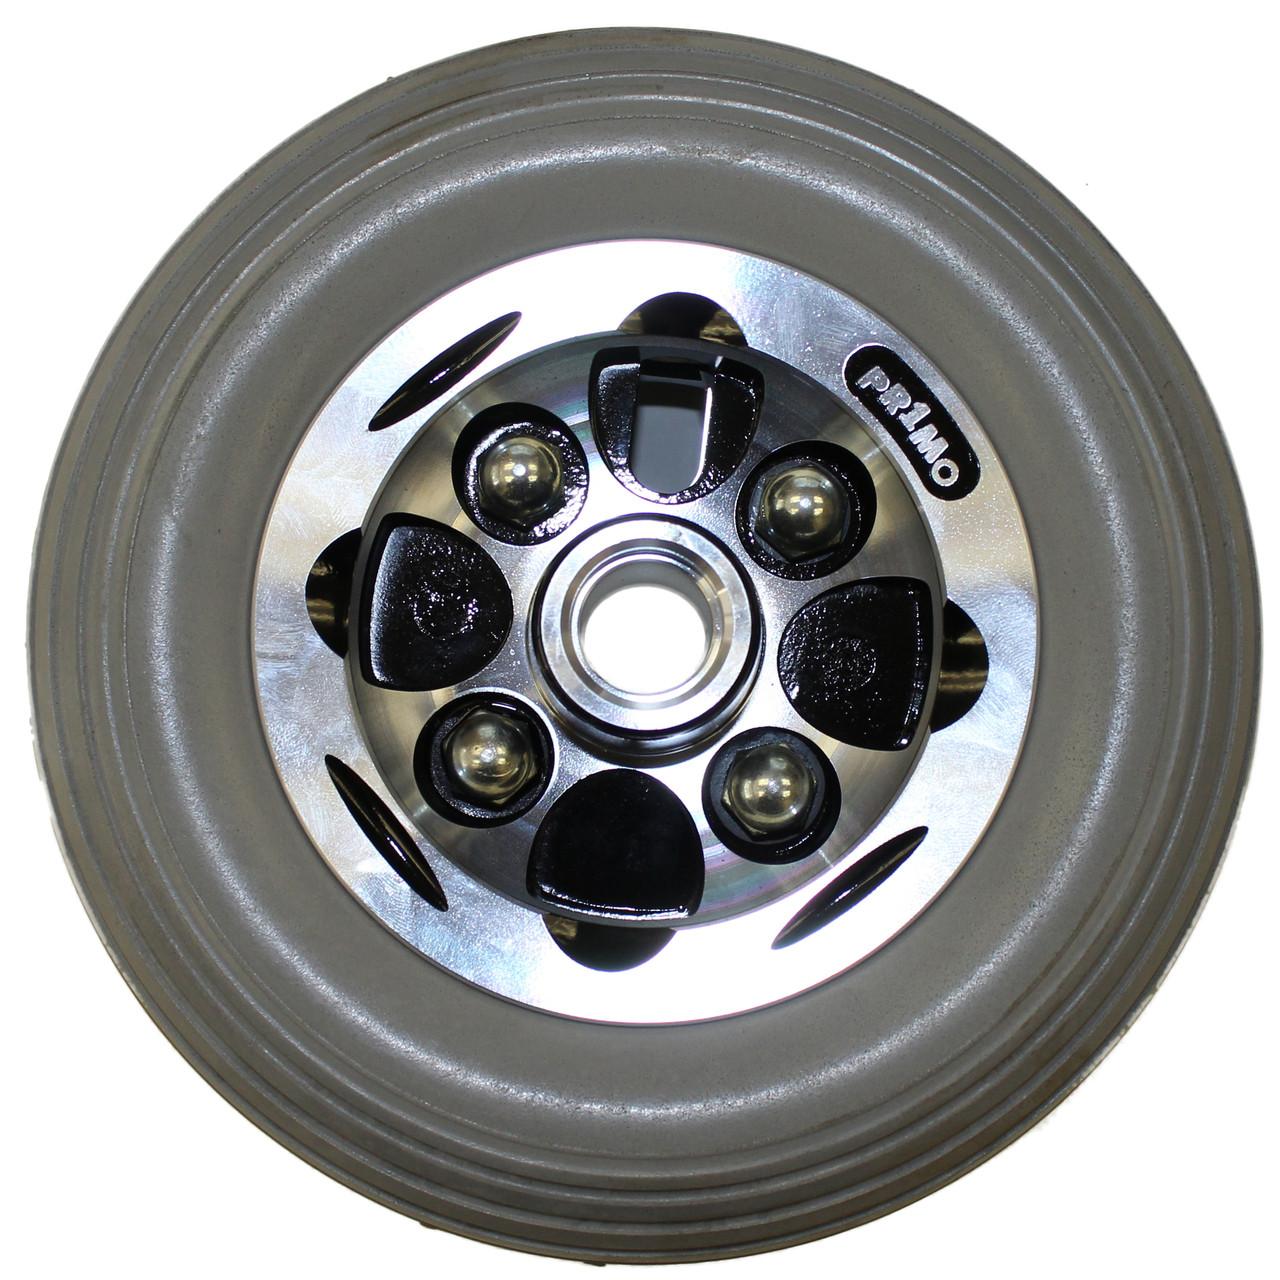 "7"" x 2"" ALLOY CASTER 2 Piece Wheel Urethane Rib Tire"